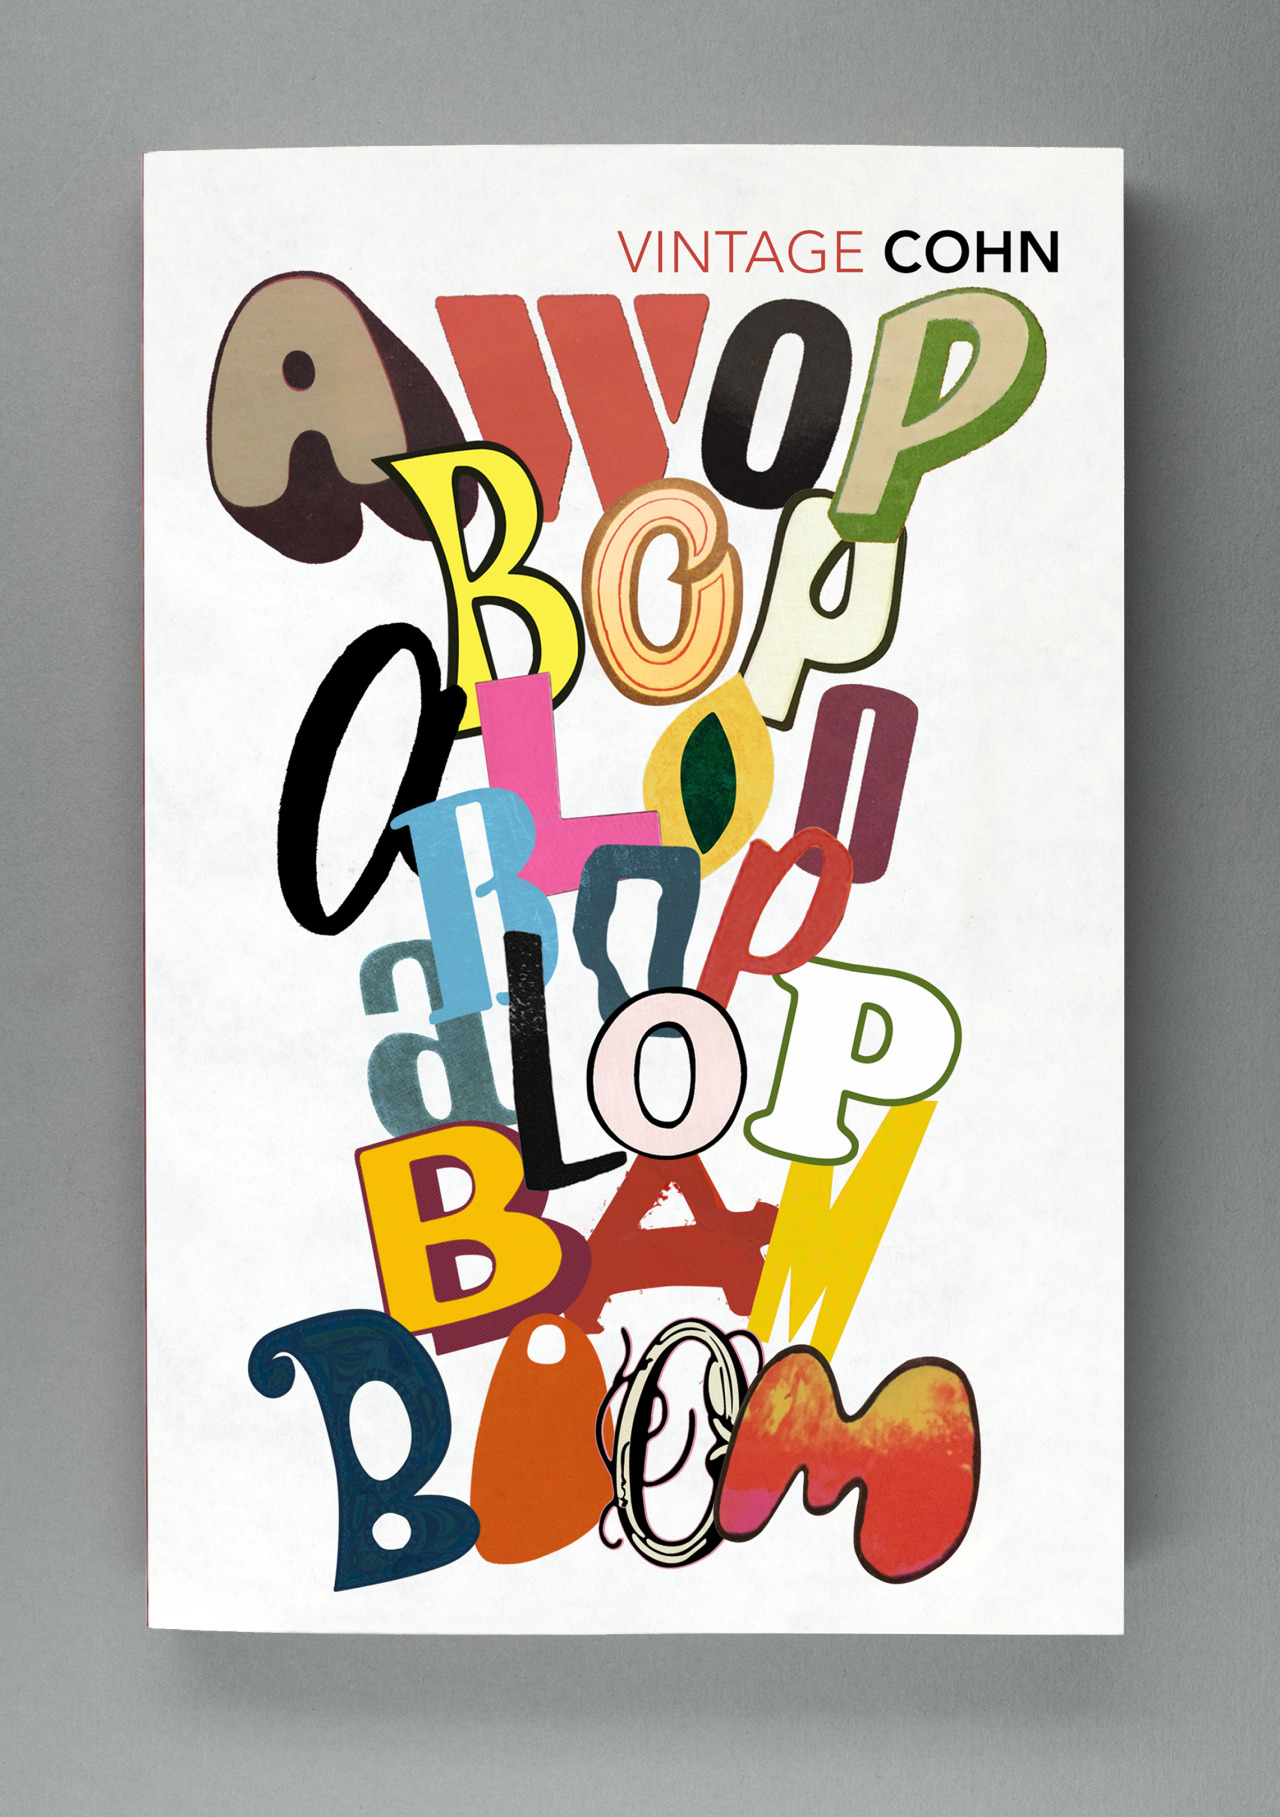 Awop-full